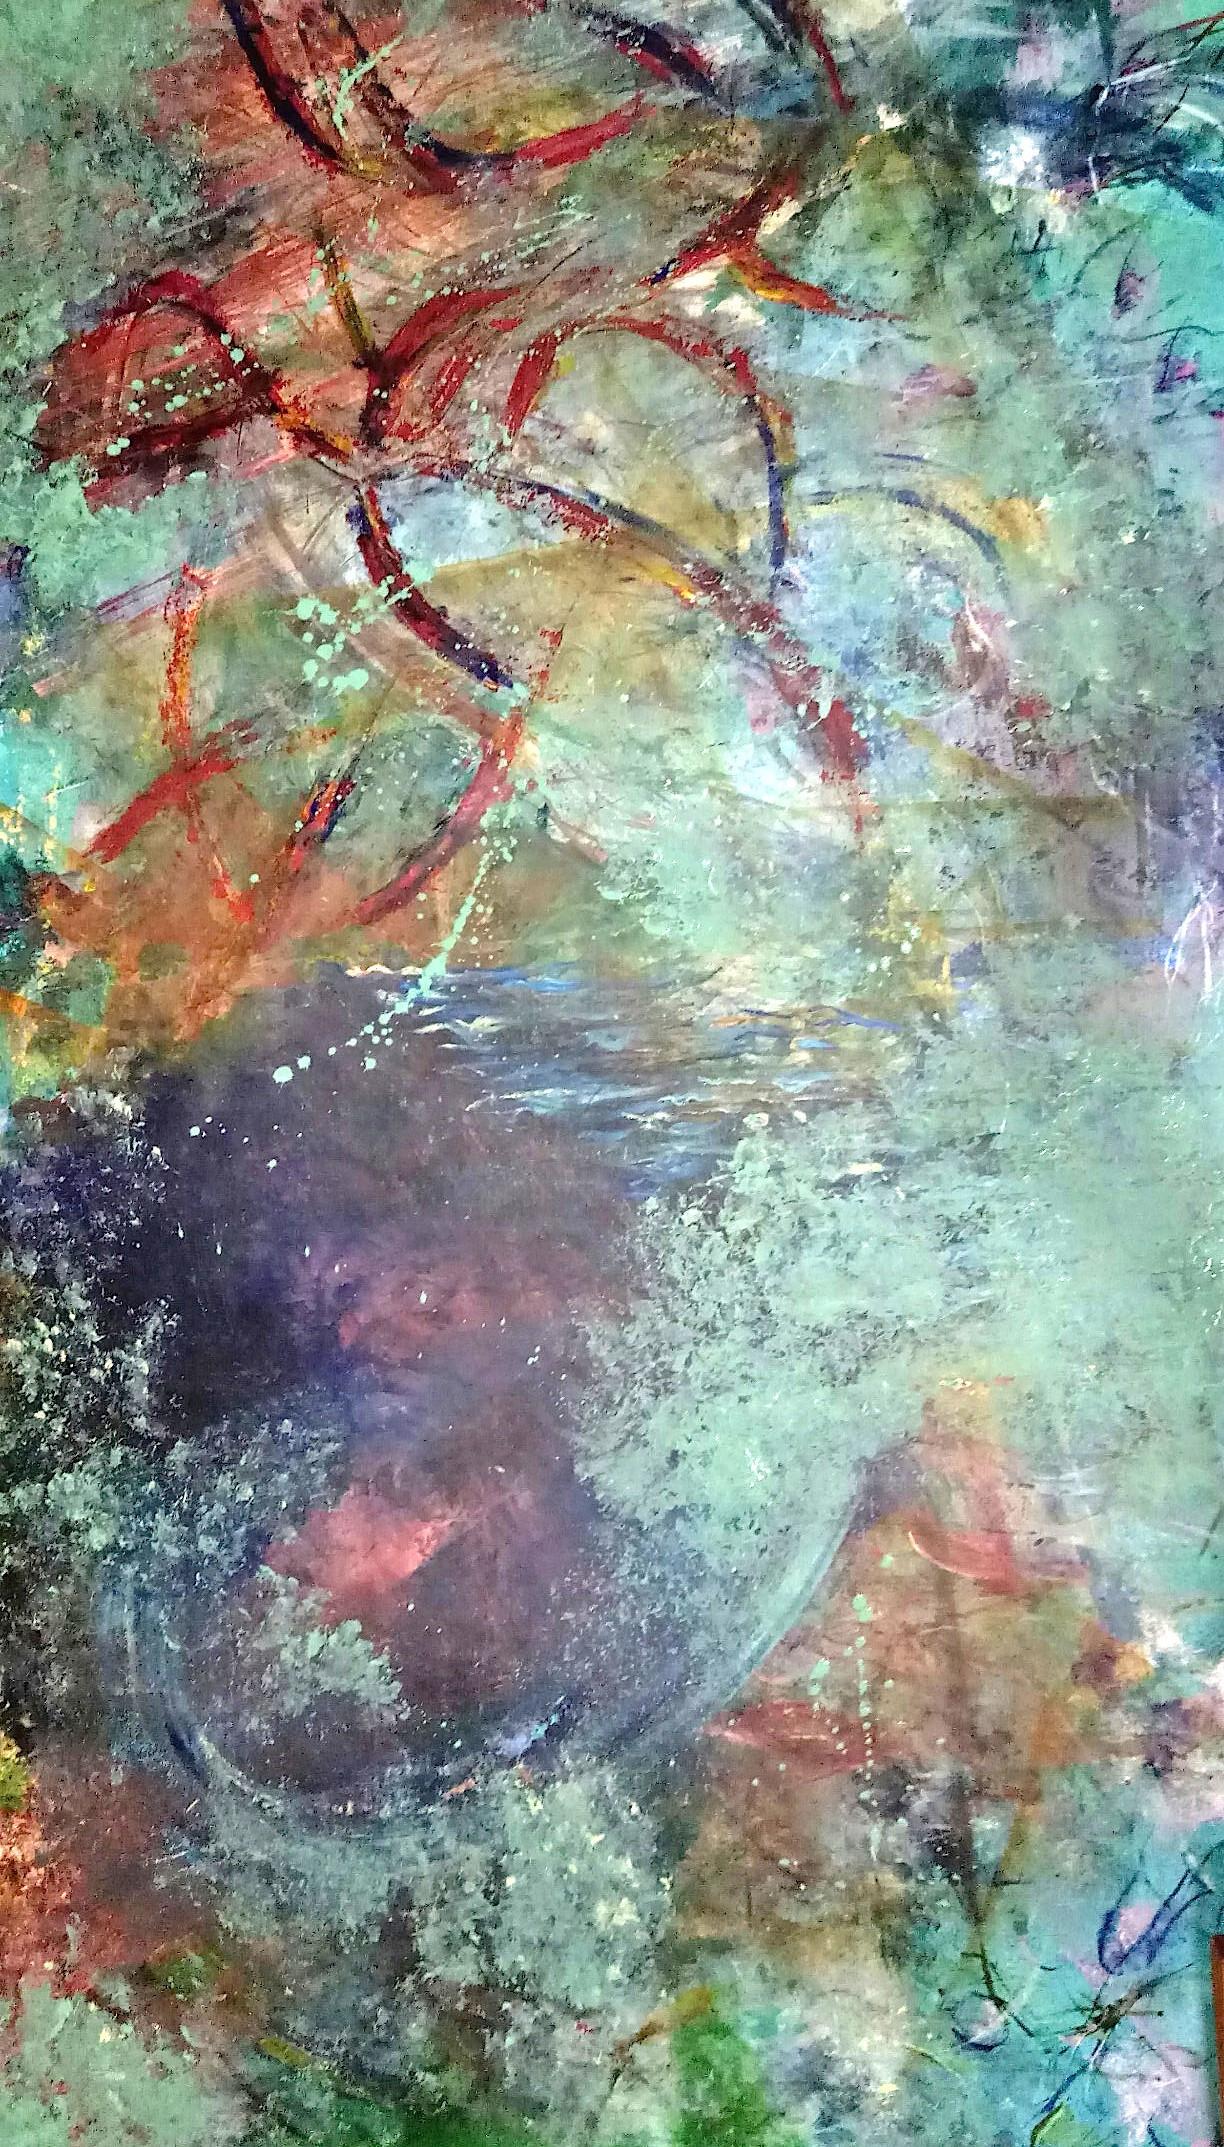 Atignas Art - Womb